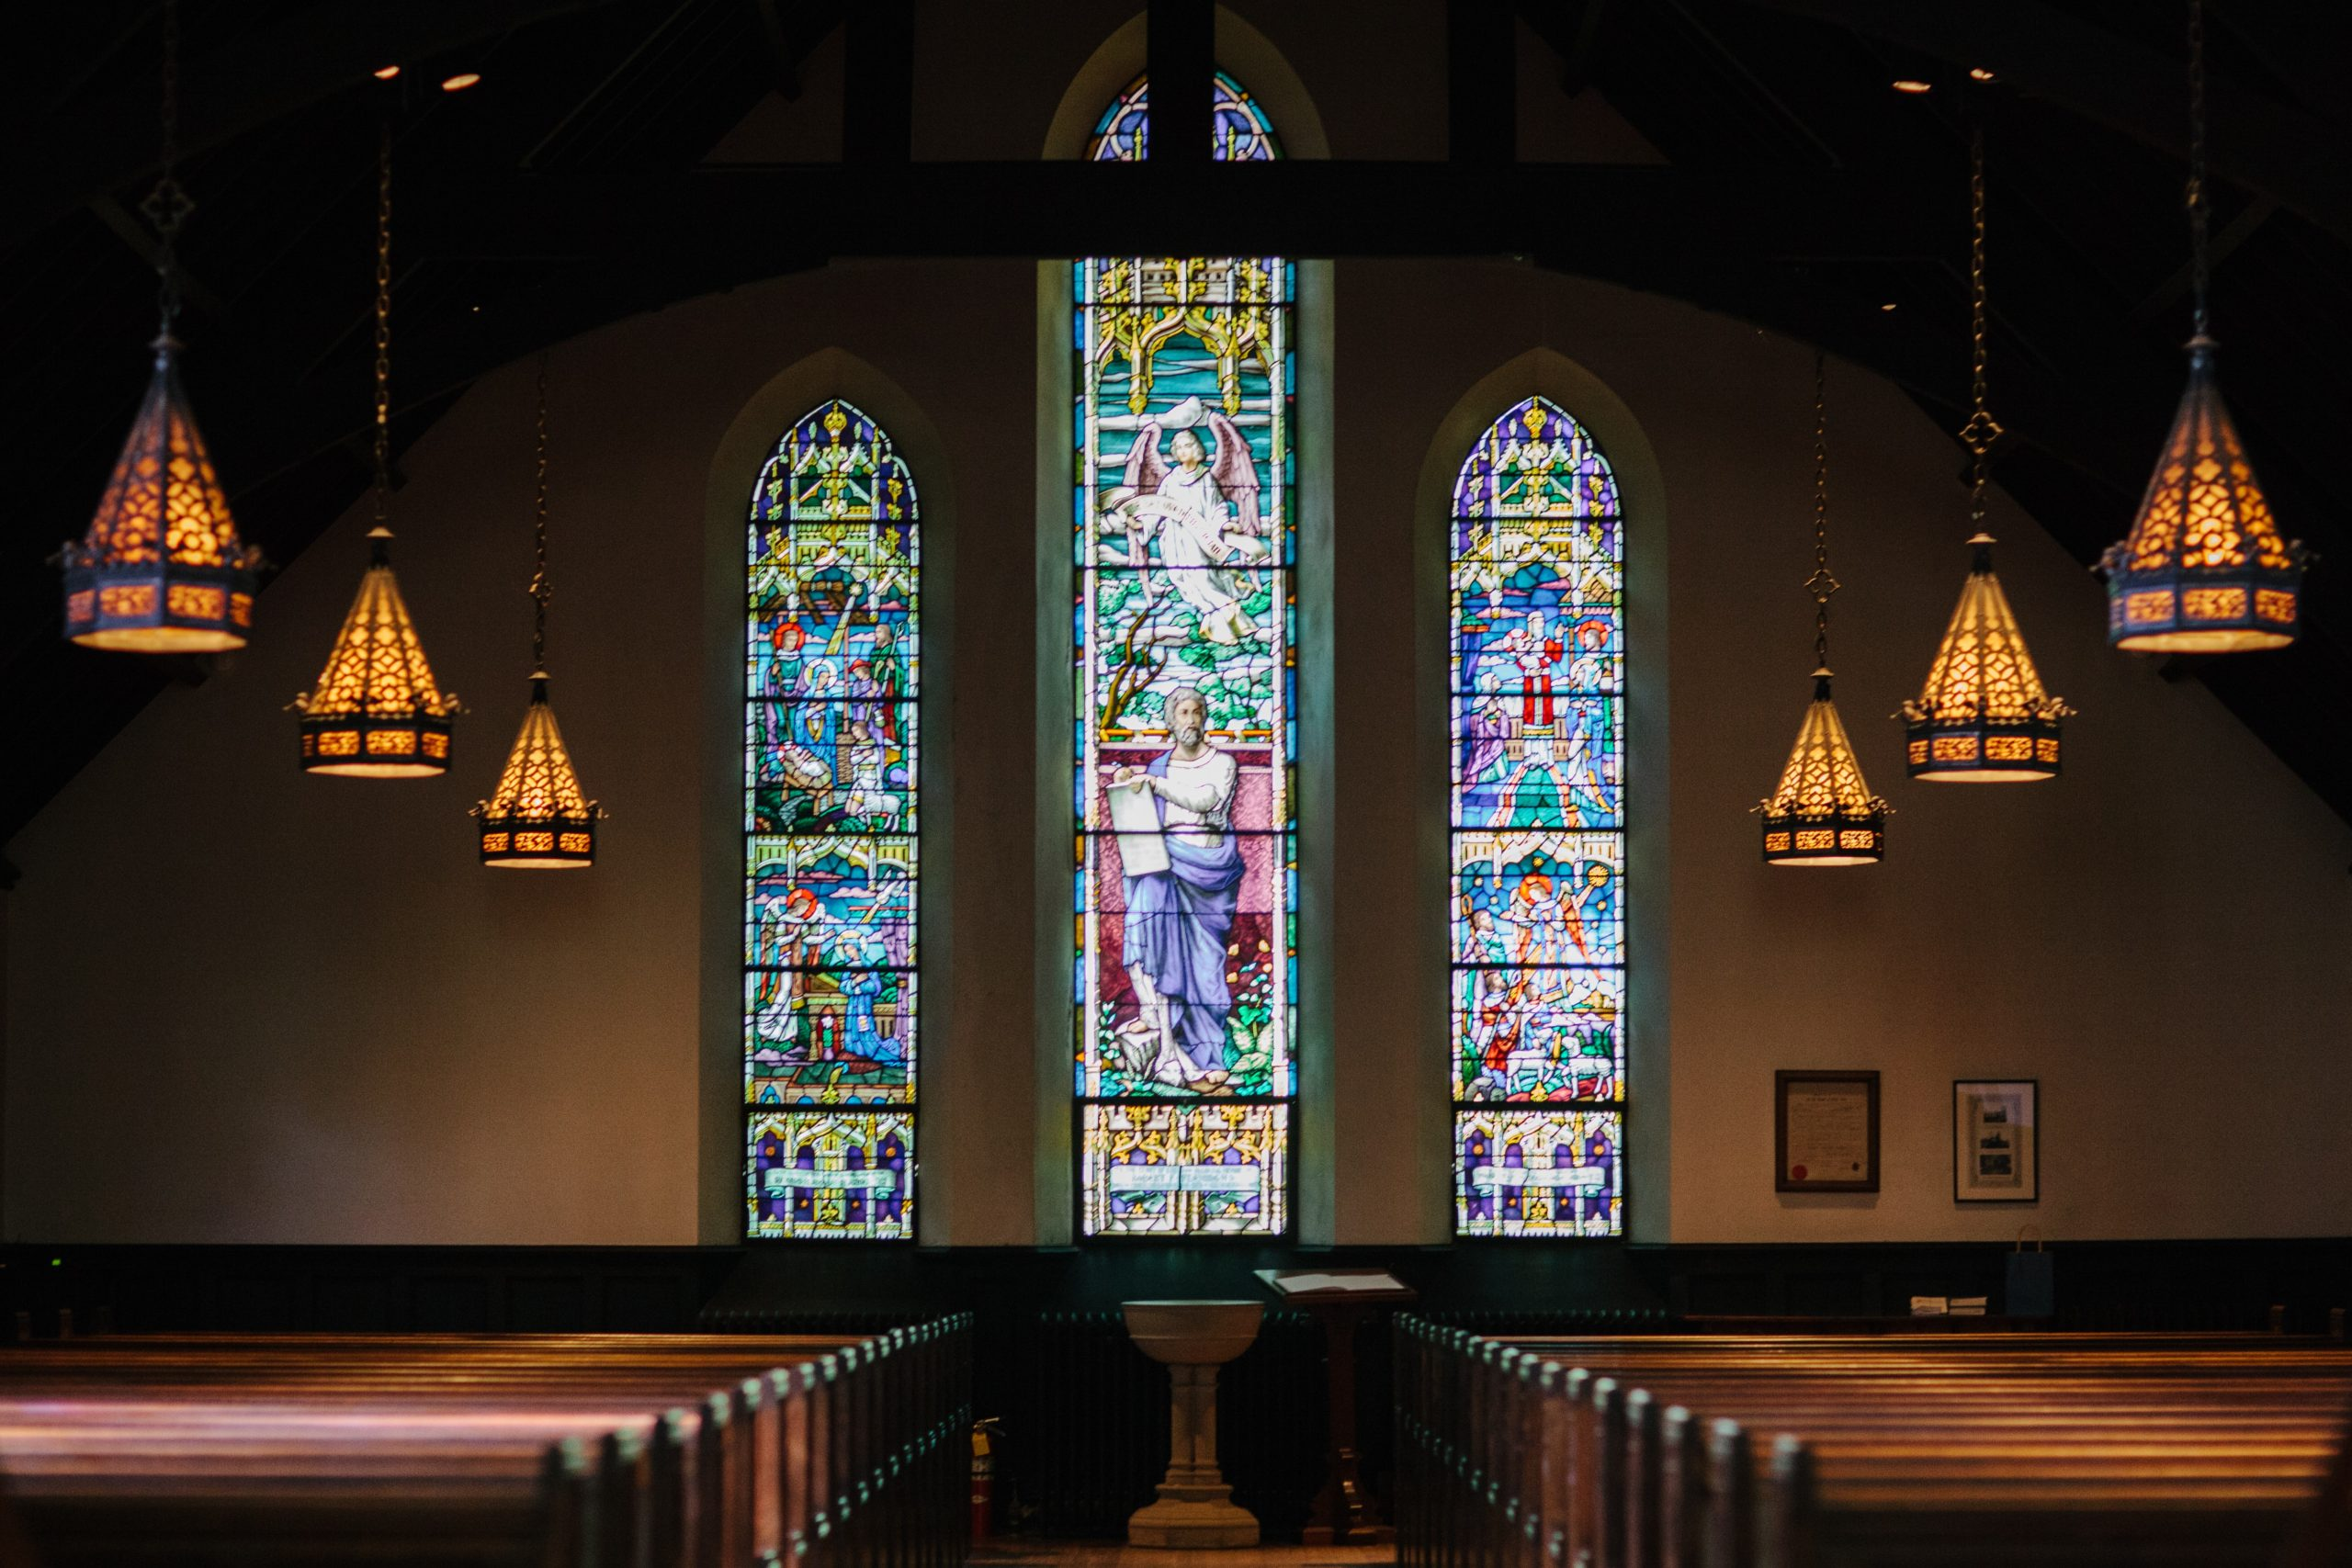 3.  My Church Community Room